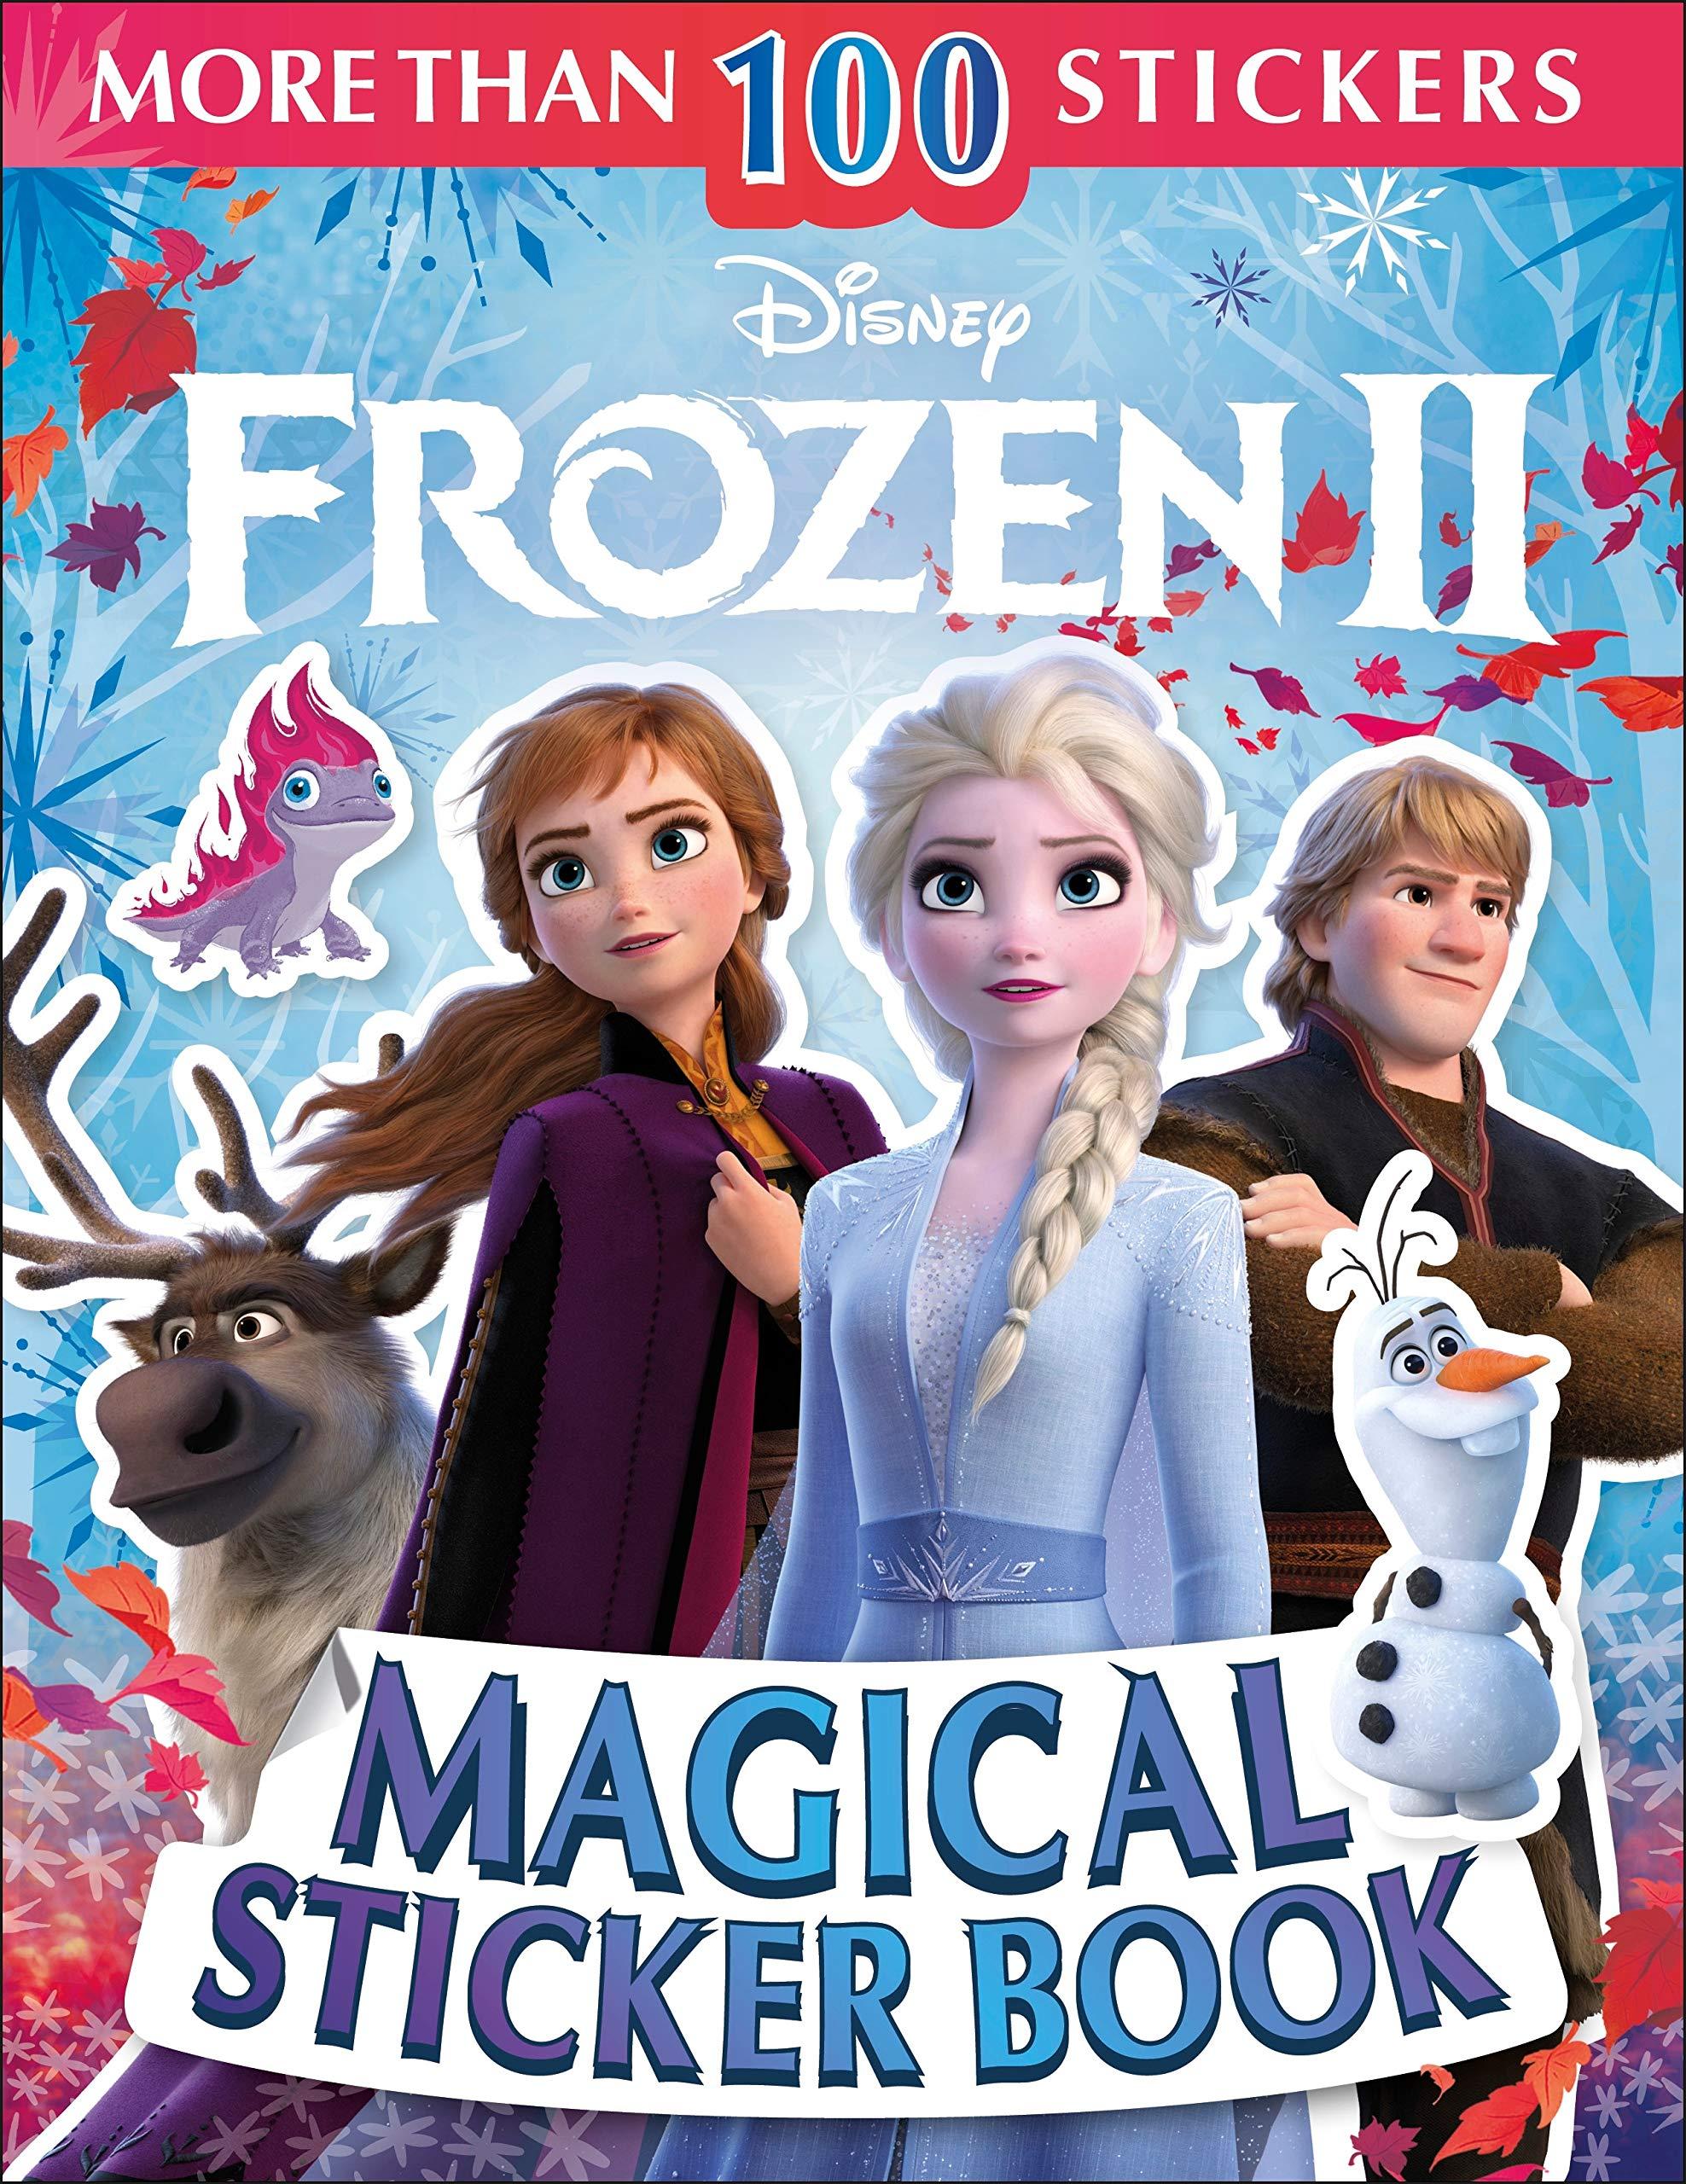 Image for Disney Frozen 2 Magical Sticker Book (Ultimate Sticker Book)